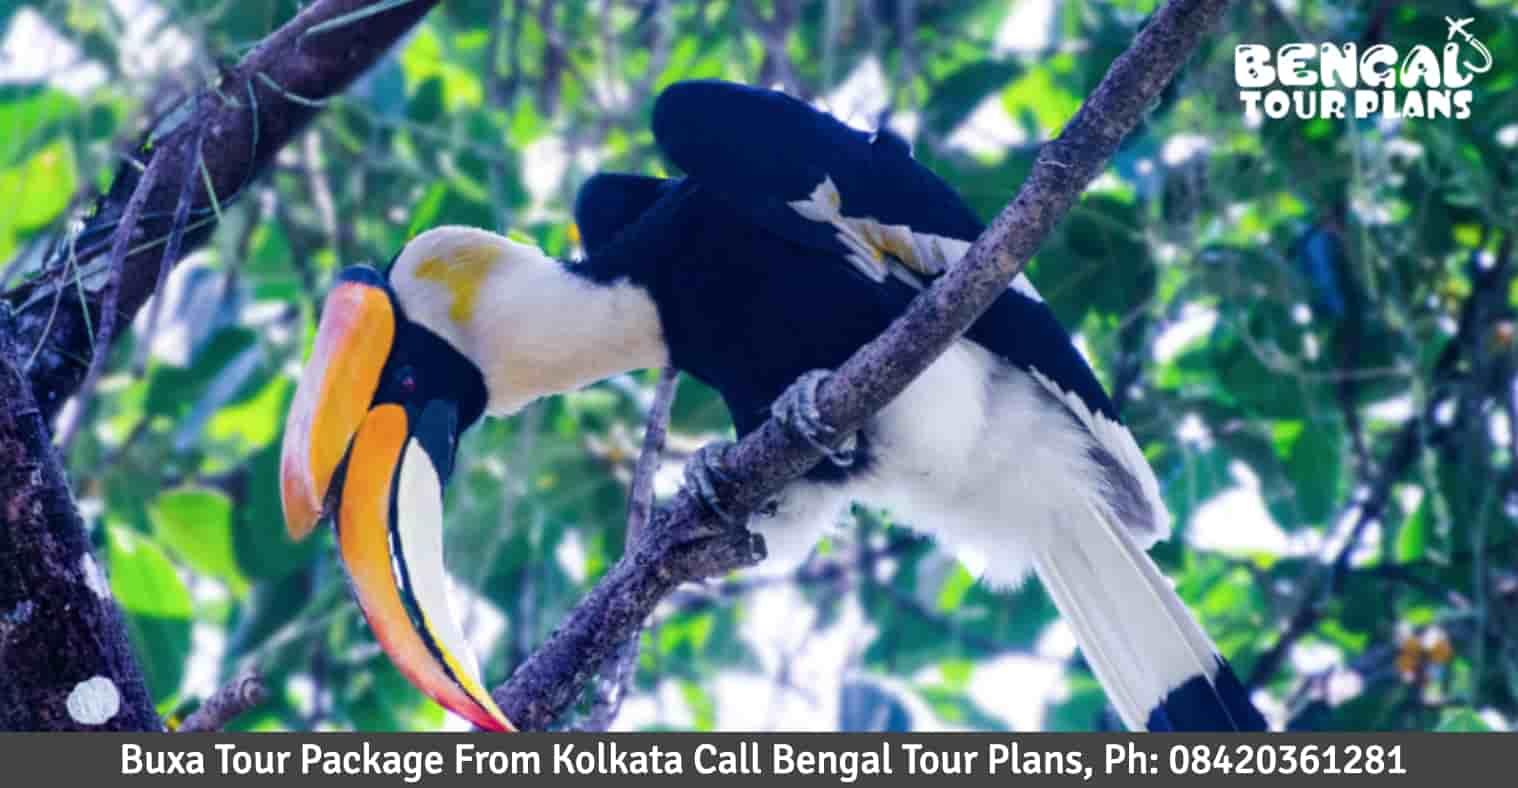 Buxa Tour Package From Kolkata